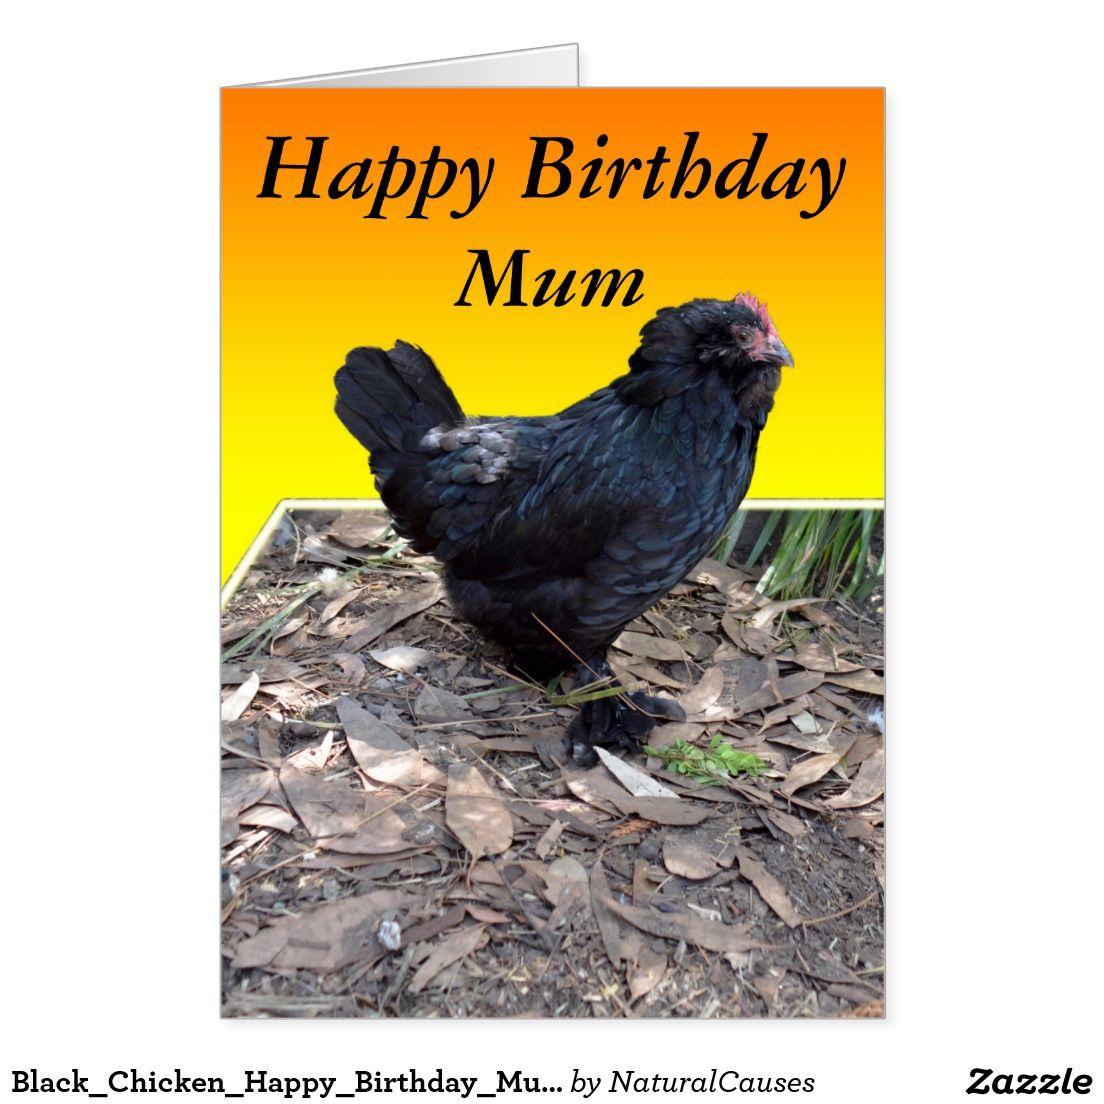 Blackchickenhappybirthdaymumgreetingcard card happy blackchickenhappybirthdaymumgreetingcard card happy birthday chickengreeting kristyandbryce Gallery